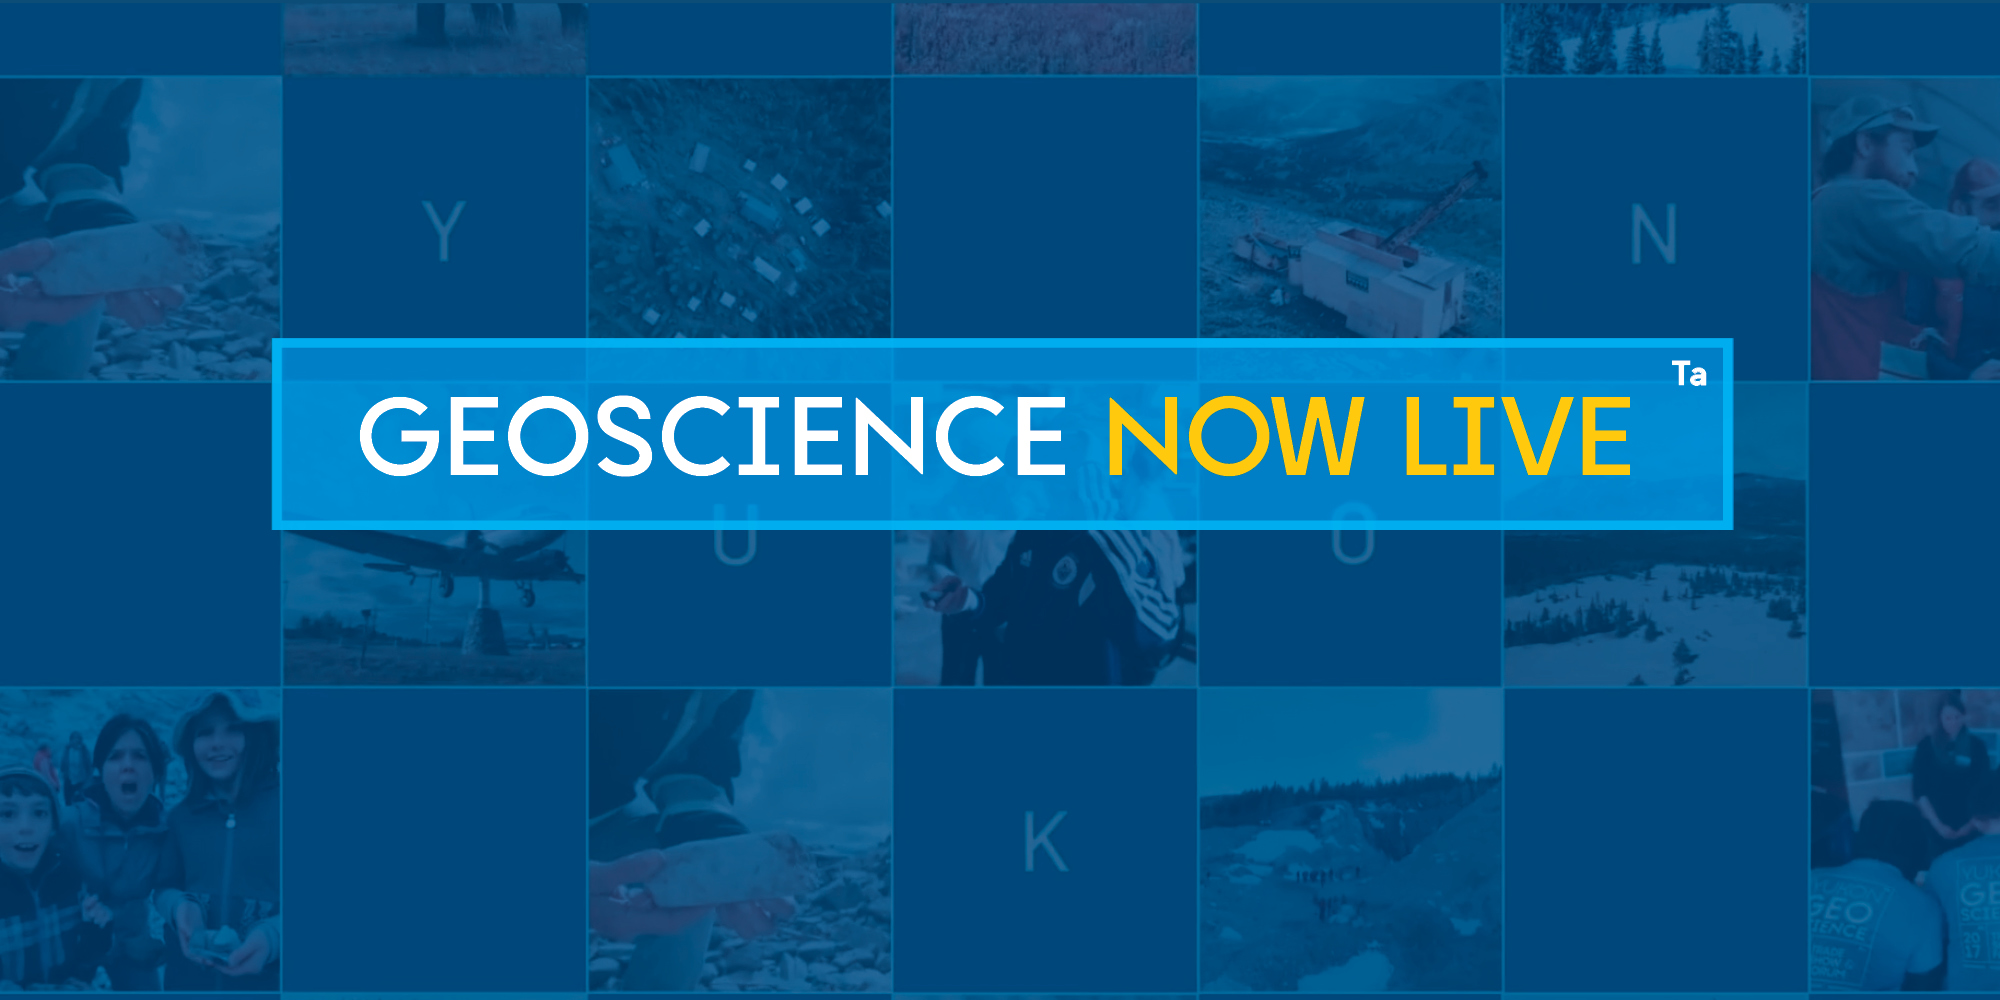 Geoscience-LIVE-2000x1000